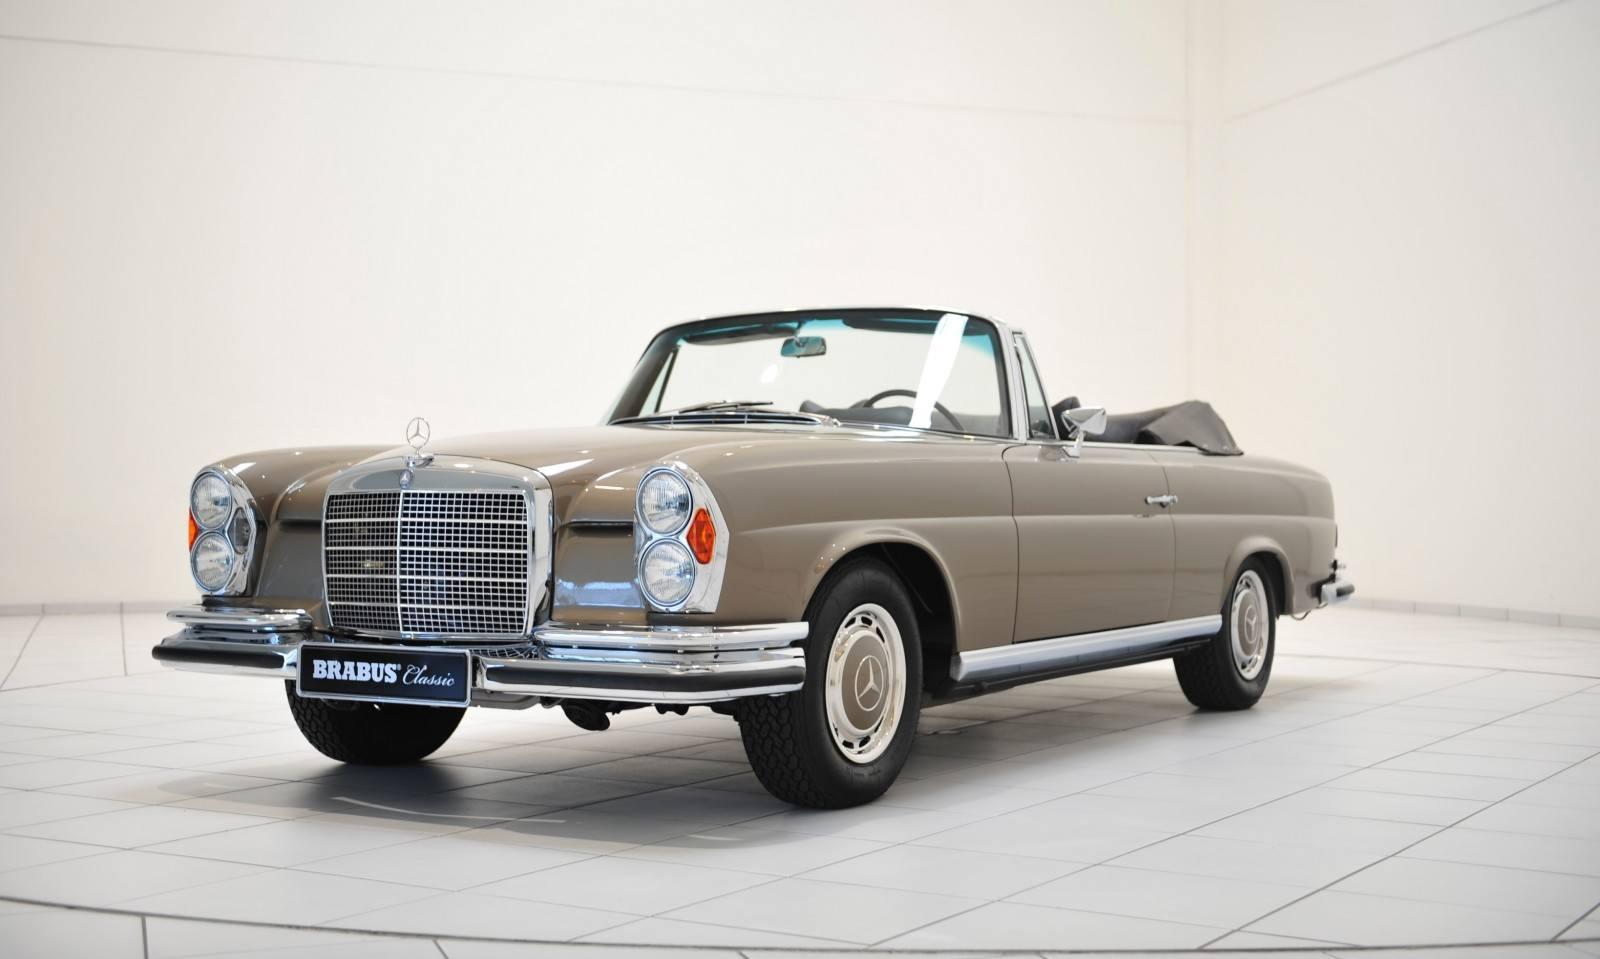 Brabus classic mercedes benz restoration examples as new for Mercedes benz restoration specialists